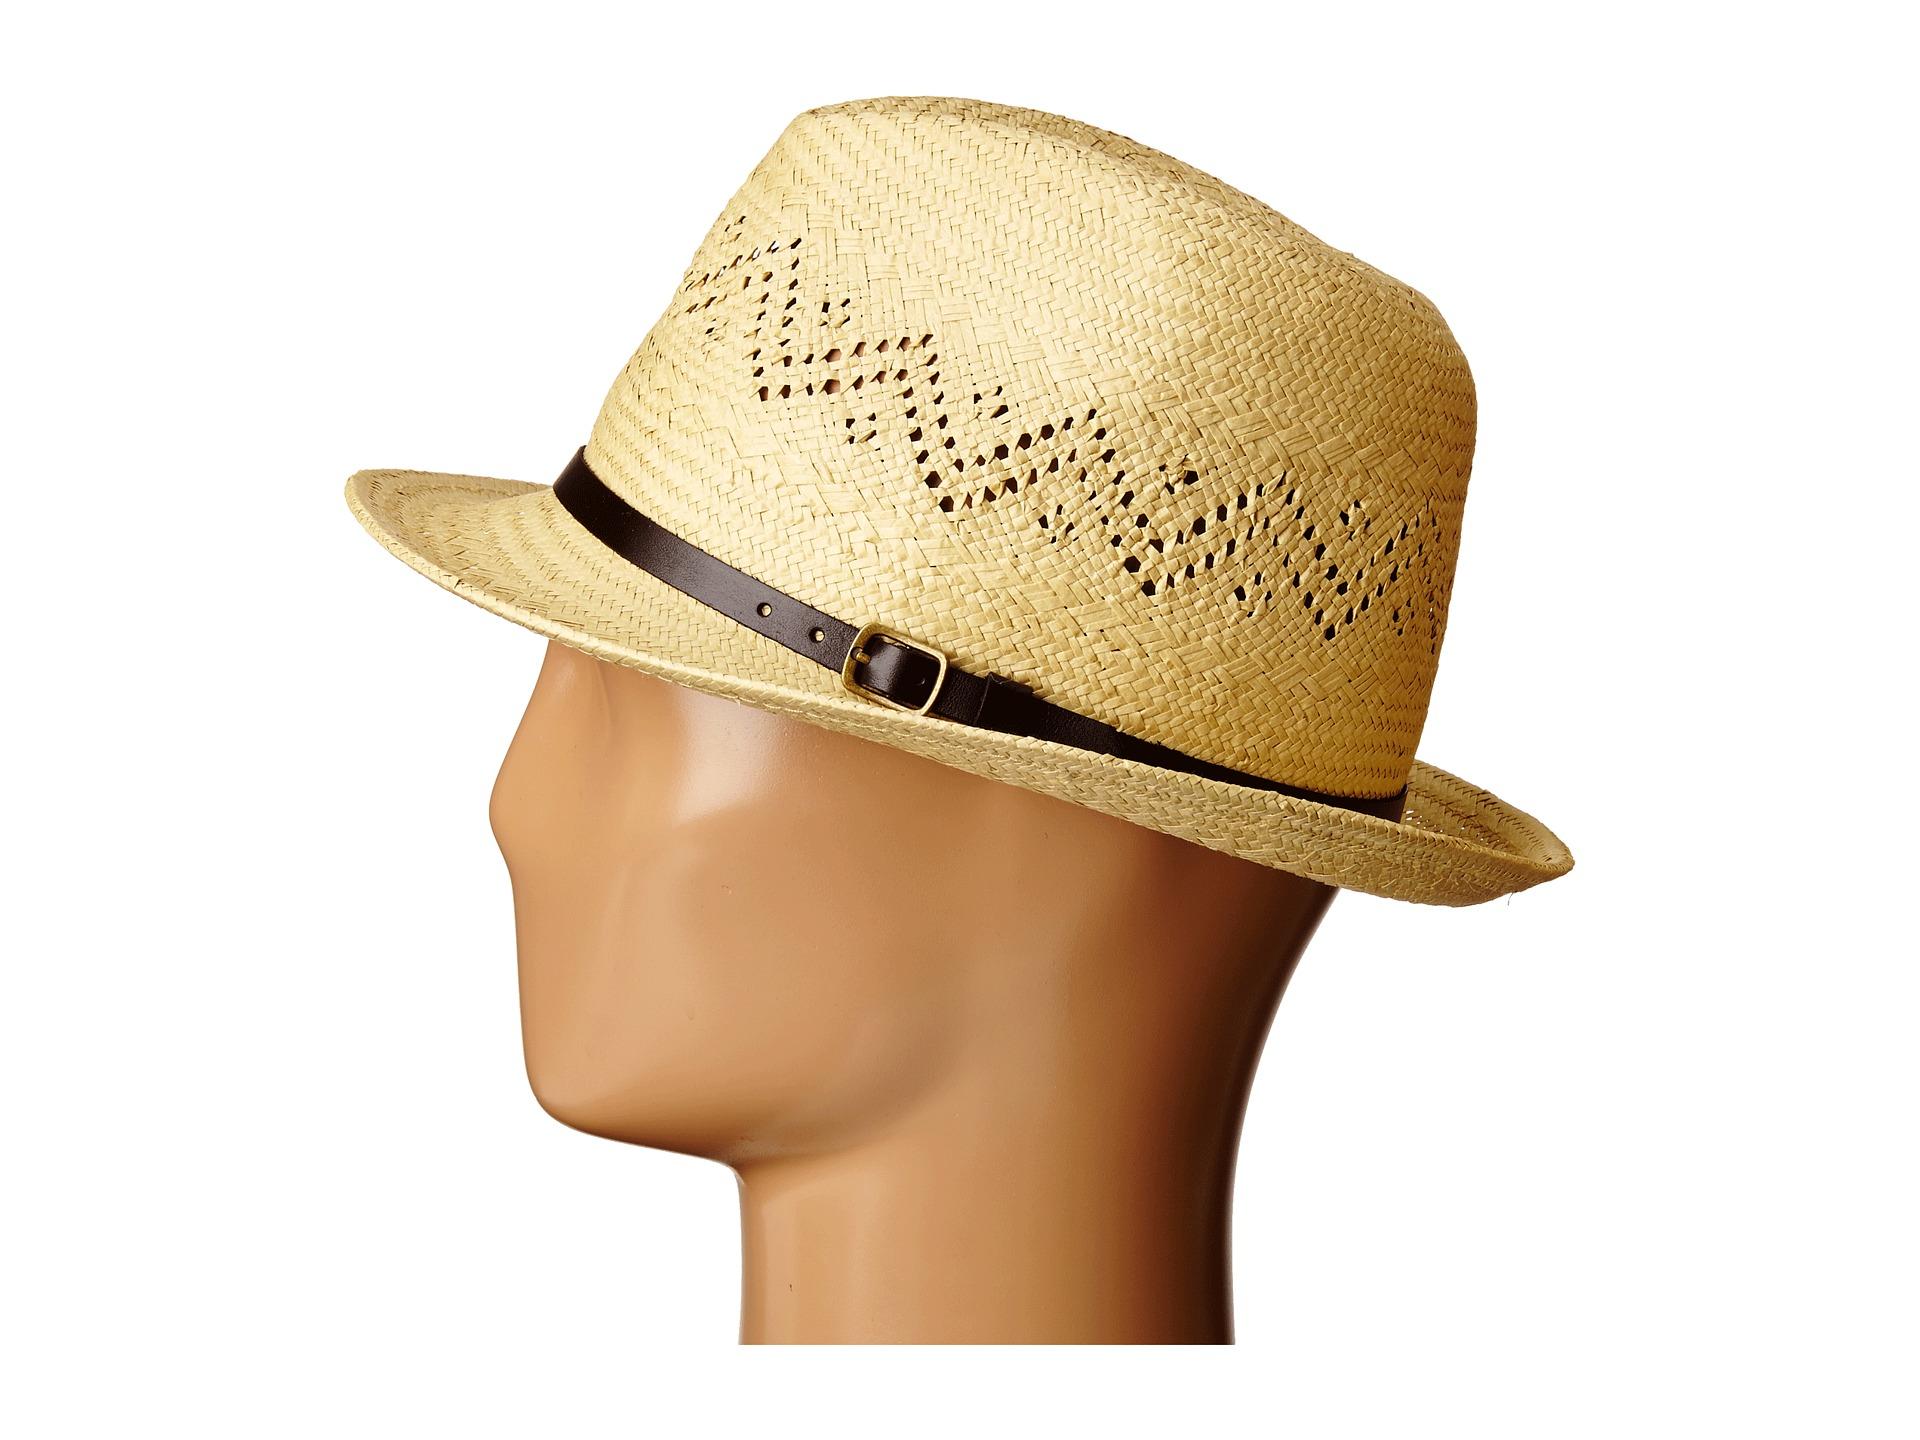 Brixton Castor Fedora Straw Hat in Natural for Men - Lyst